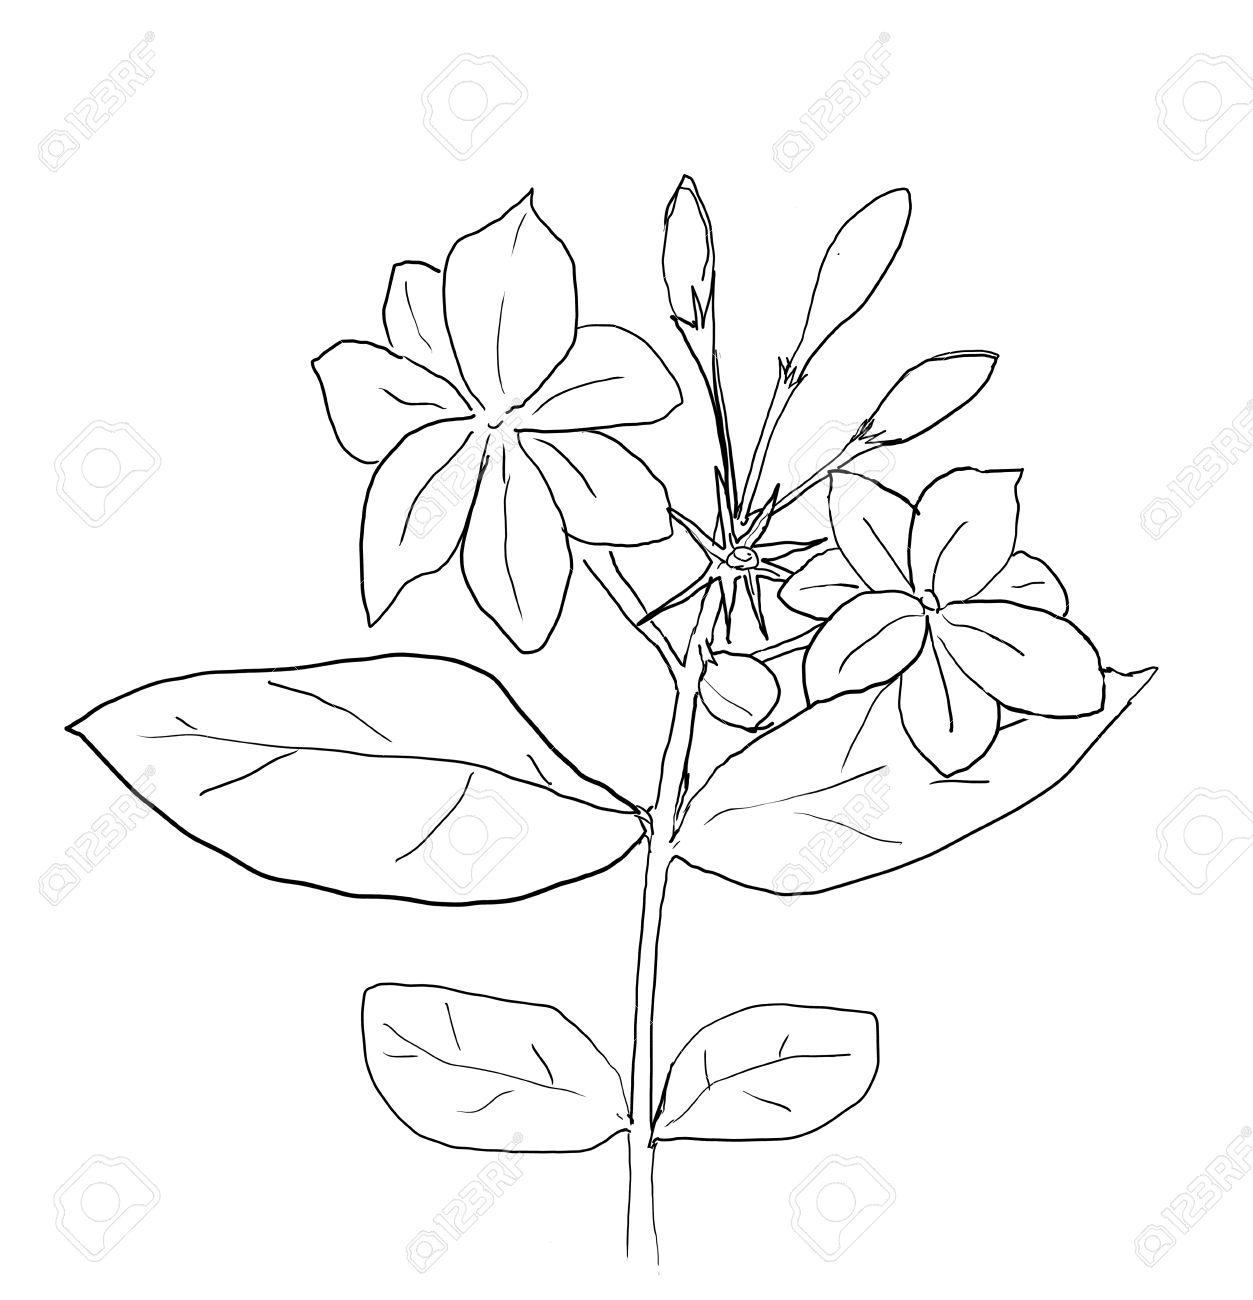 1253x1300 Arabian Jasmine Flower Drawing Line Art Stock Photo, Picture